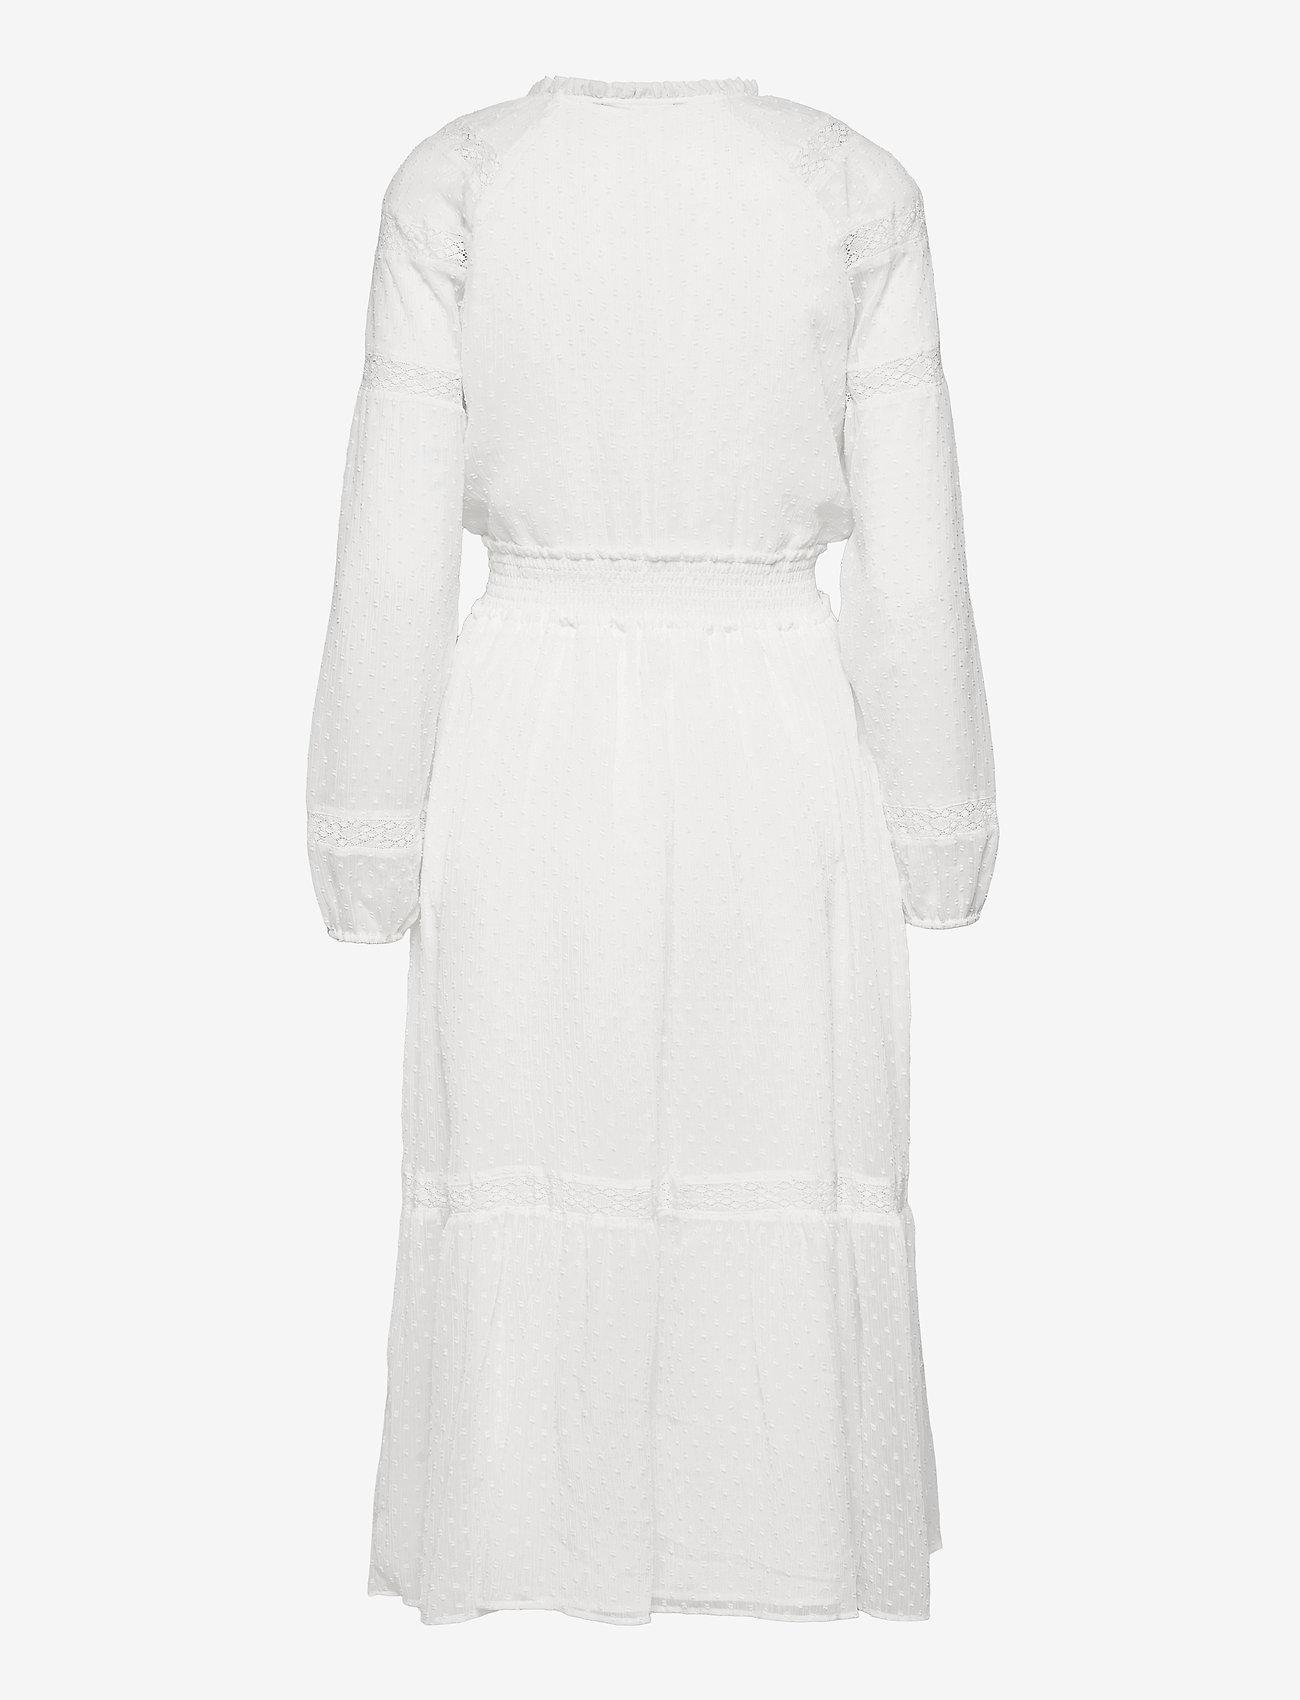 Lauren Ralph Lauren - Polka-Dot Lace-Trim Dobby Dress - alledaagse jurken - lauren white - 2